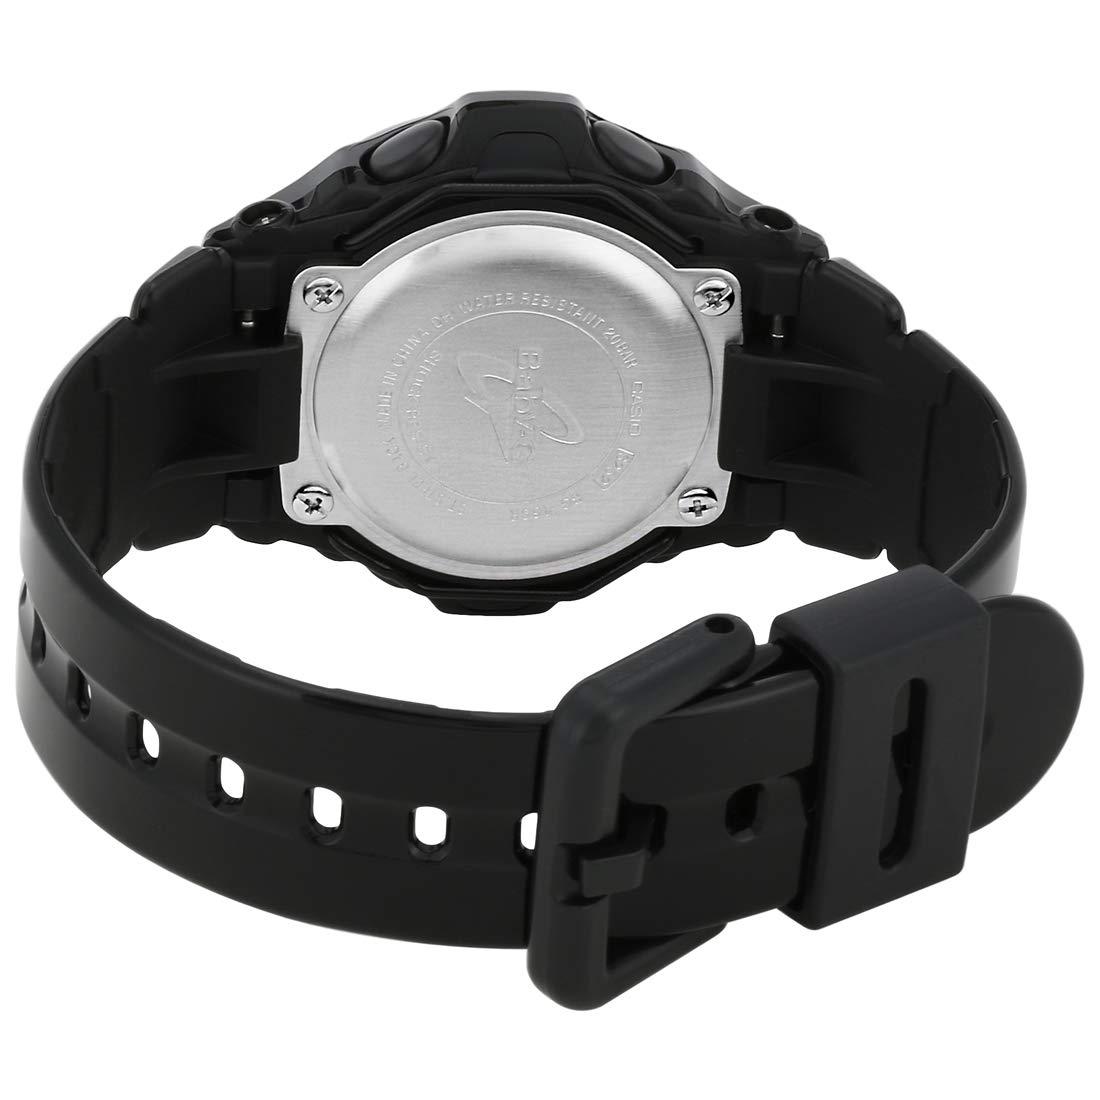 Amazon.com: Casio G Shock BG-169R-1BCR Baby-G - Reloj de ...